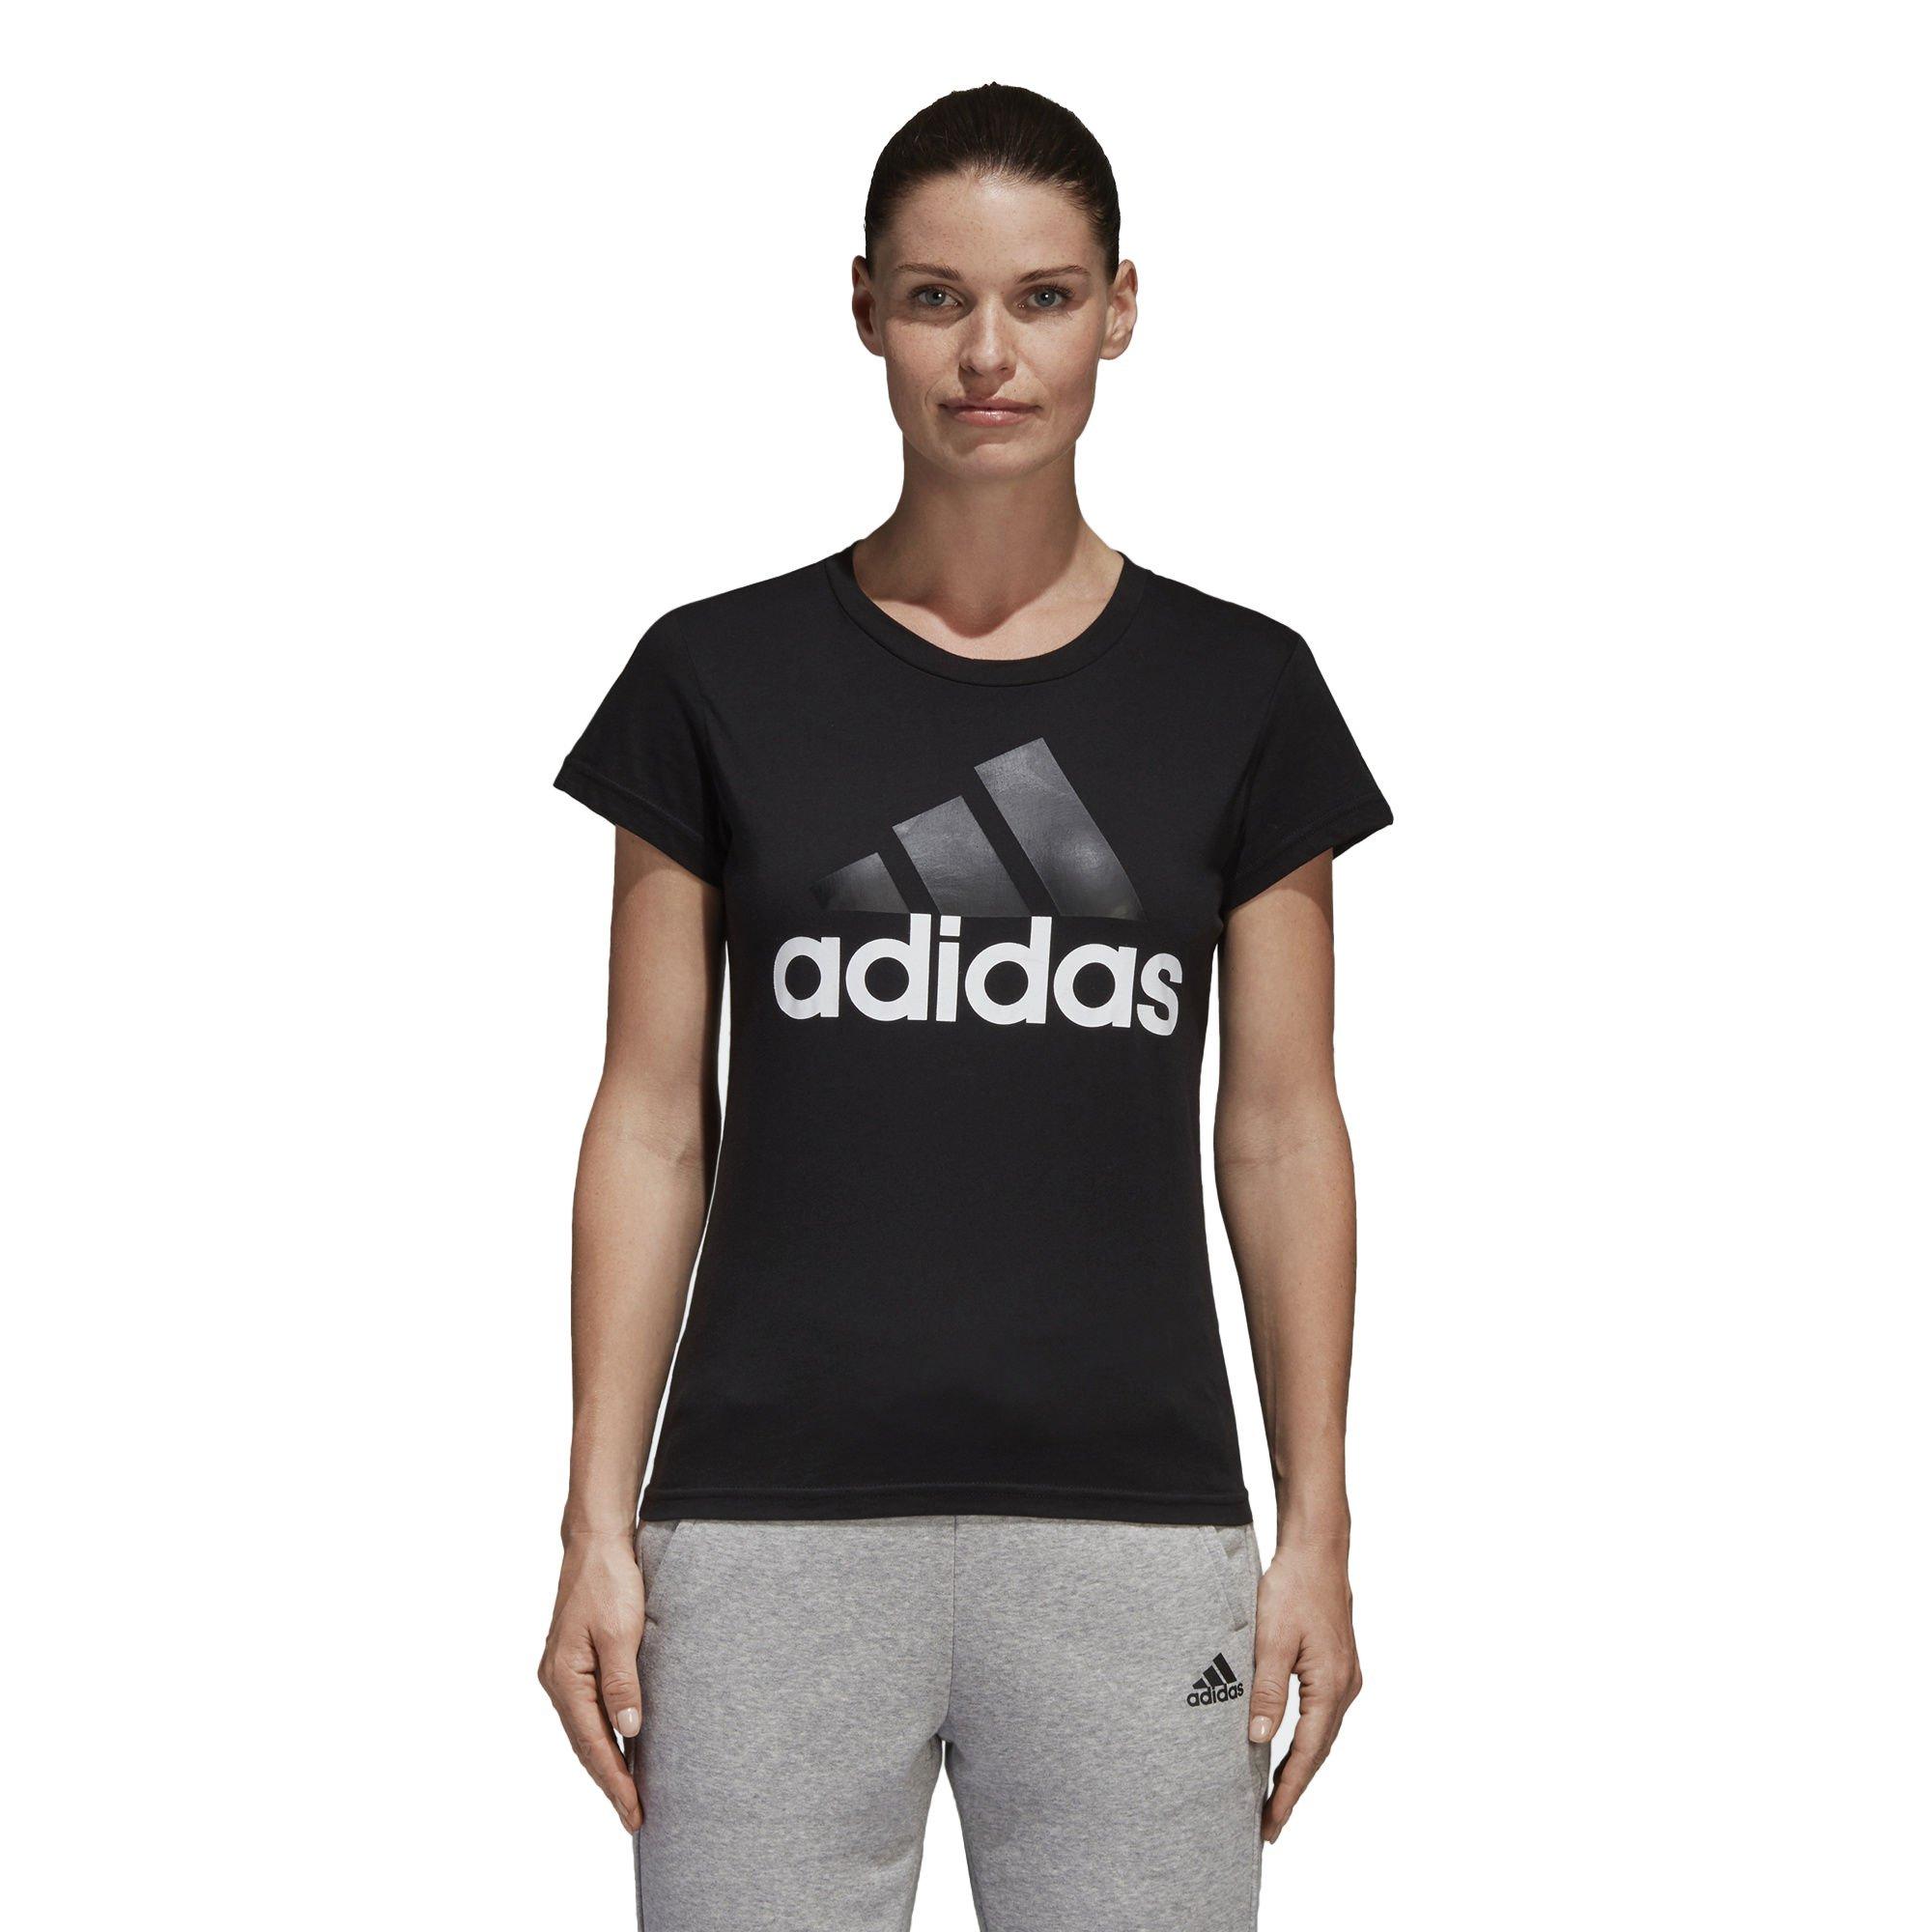 adidas Damen Linear Ärmellos T Shirt Top Trägertop Funktions Rundhals Training